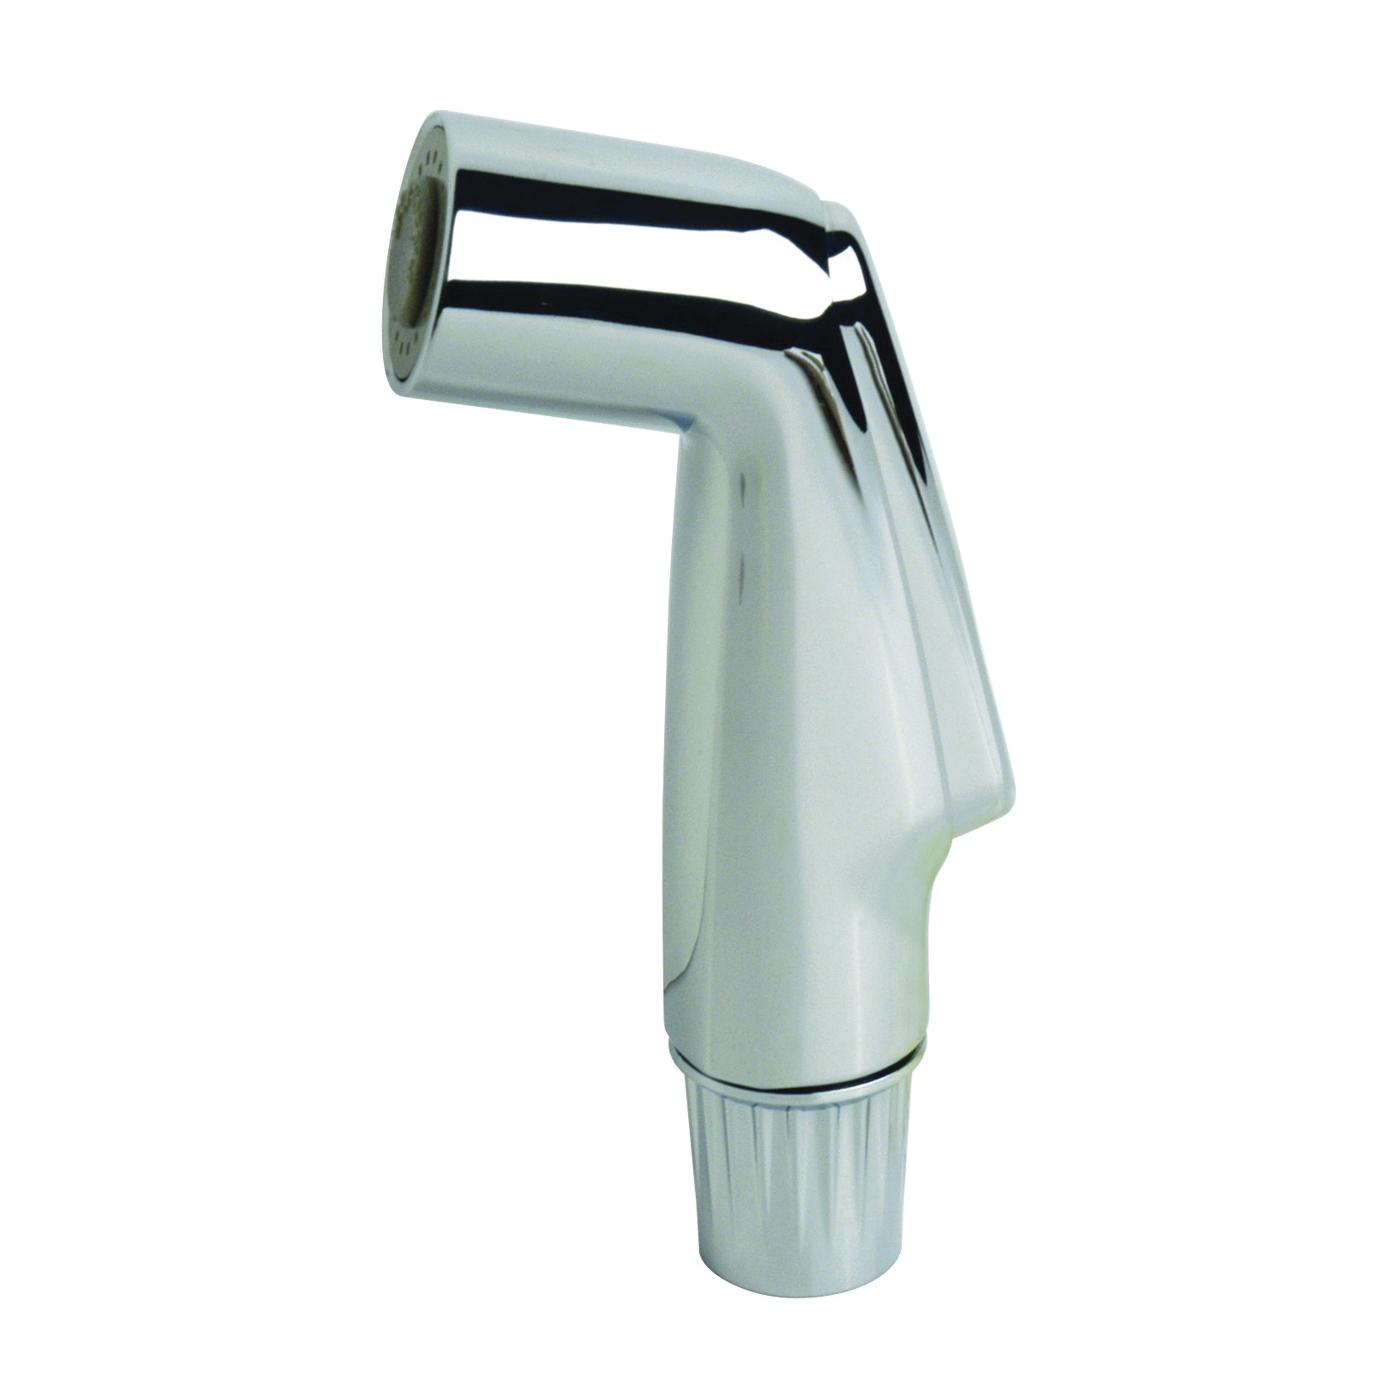 Picture of Danco 88760 Sink Spray Head, Plastic